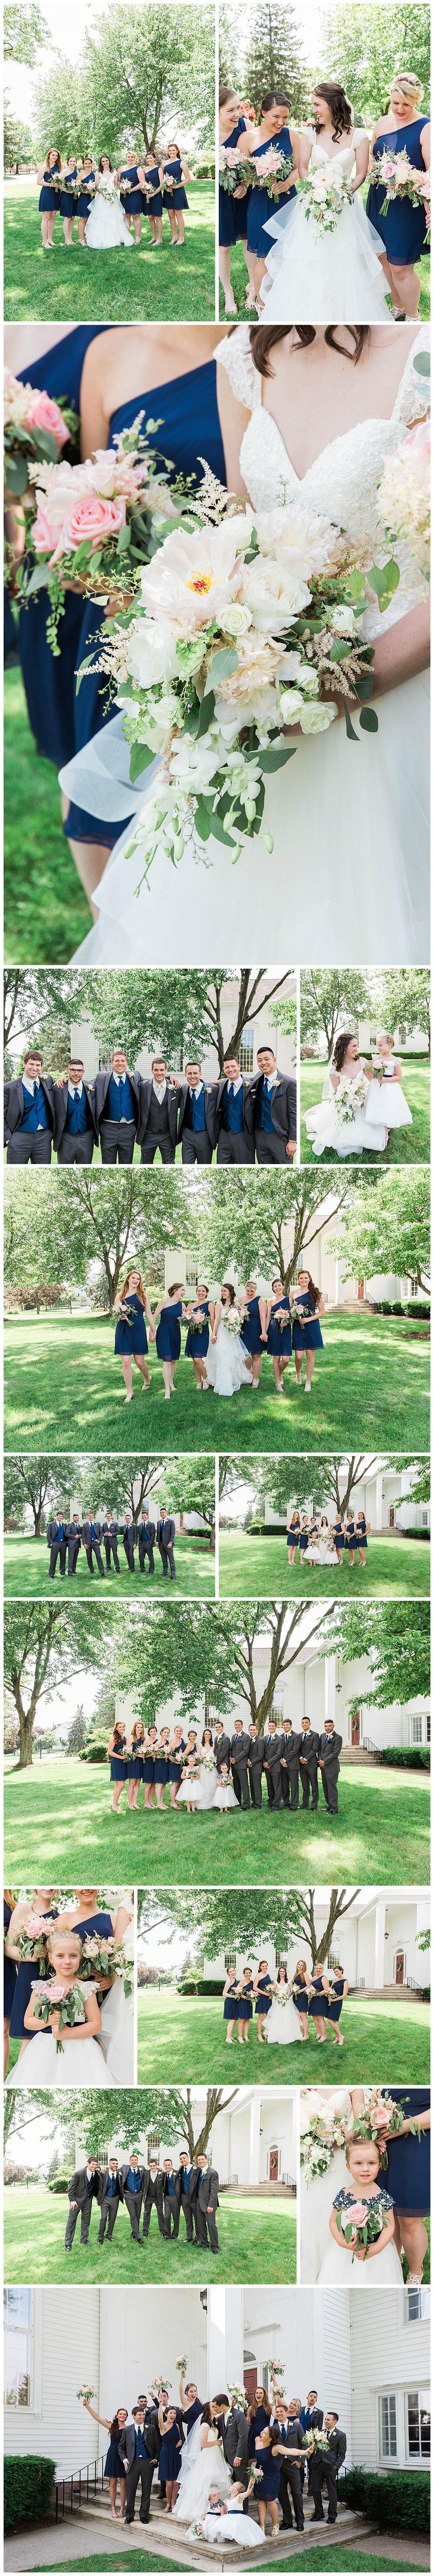 Cleveland-Wedding-Photographer_0020.jpg